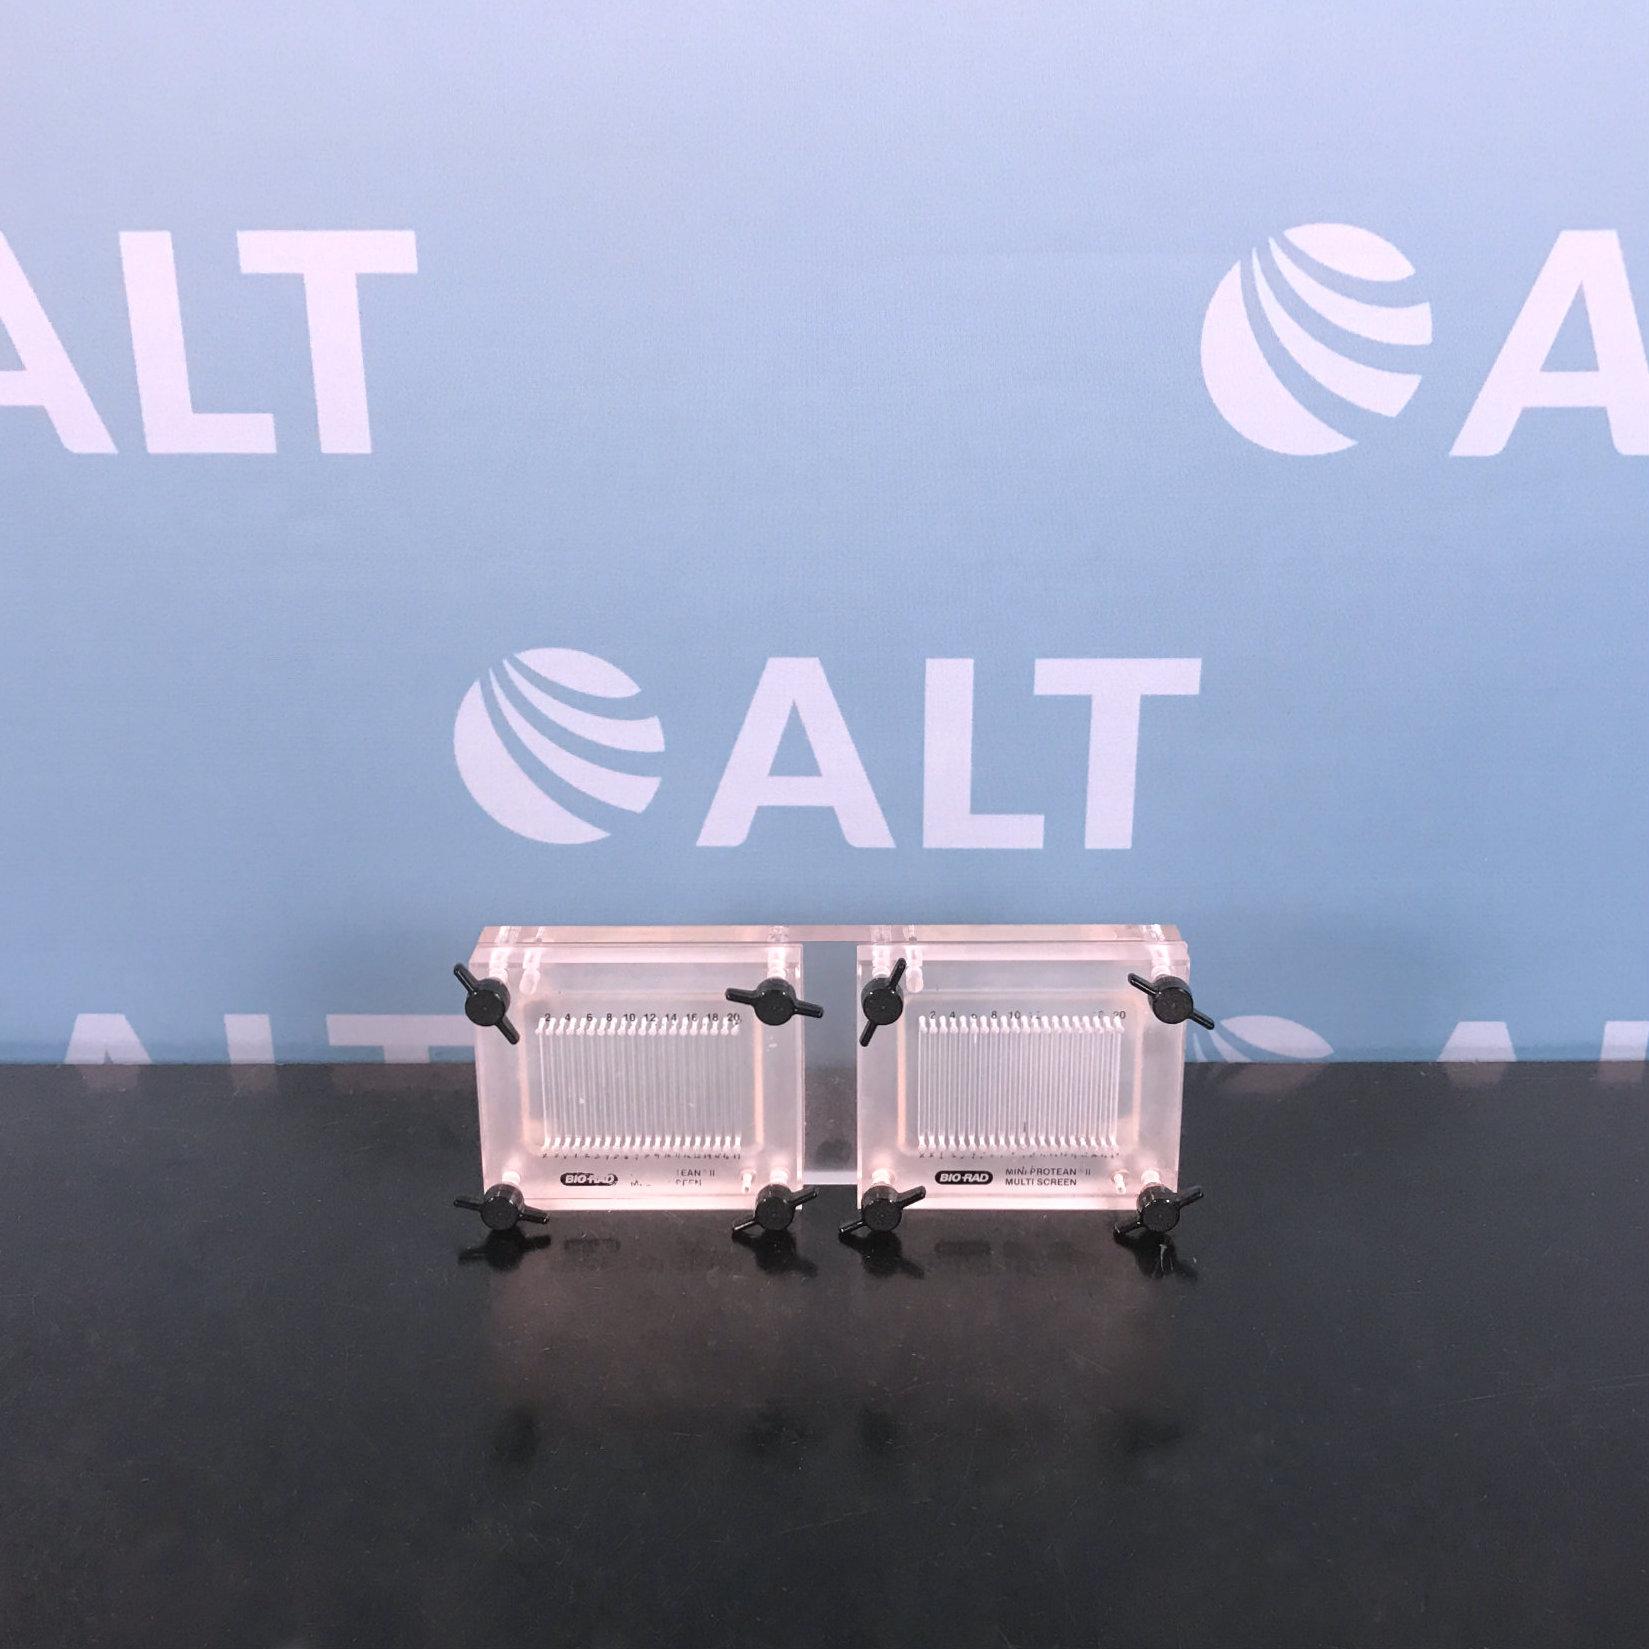 Bio-Rad Mini-Protean II Electrophoresis Gel Chamber Model 170-4017 Image